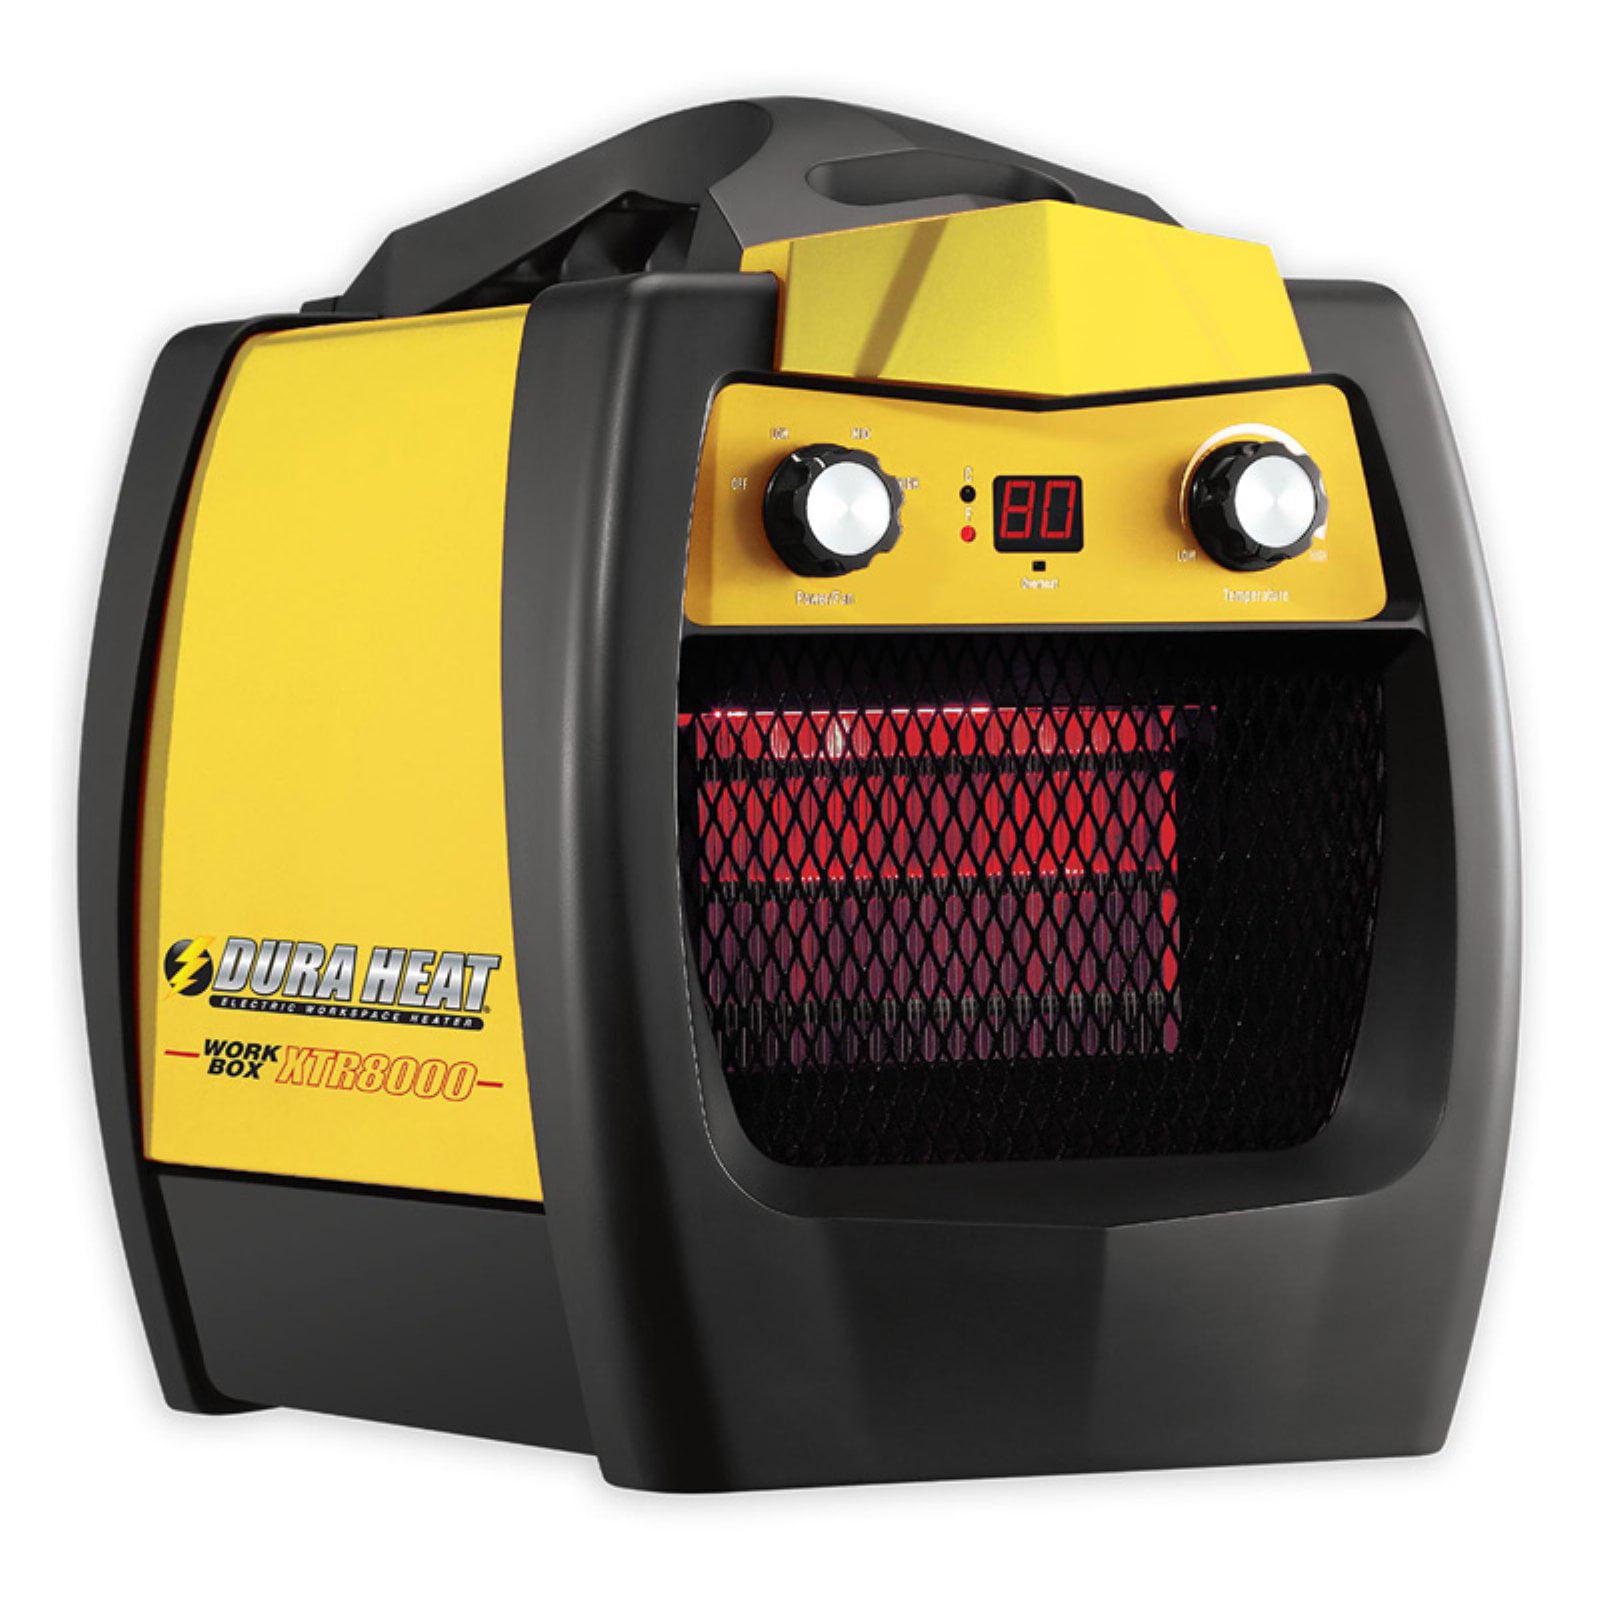 WORLD MARKETING OF AMERICA XTR8000 1500W Work Utility Heater